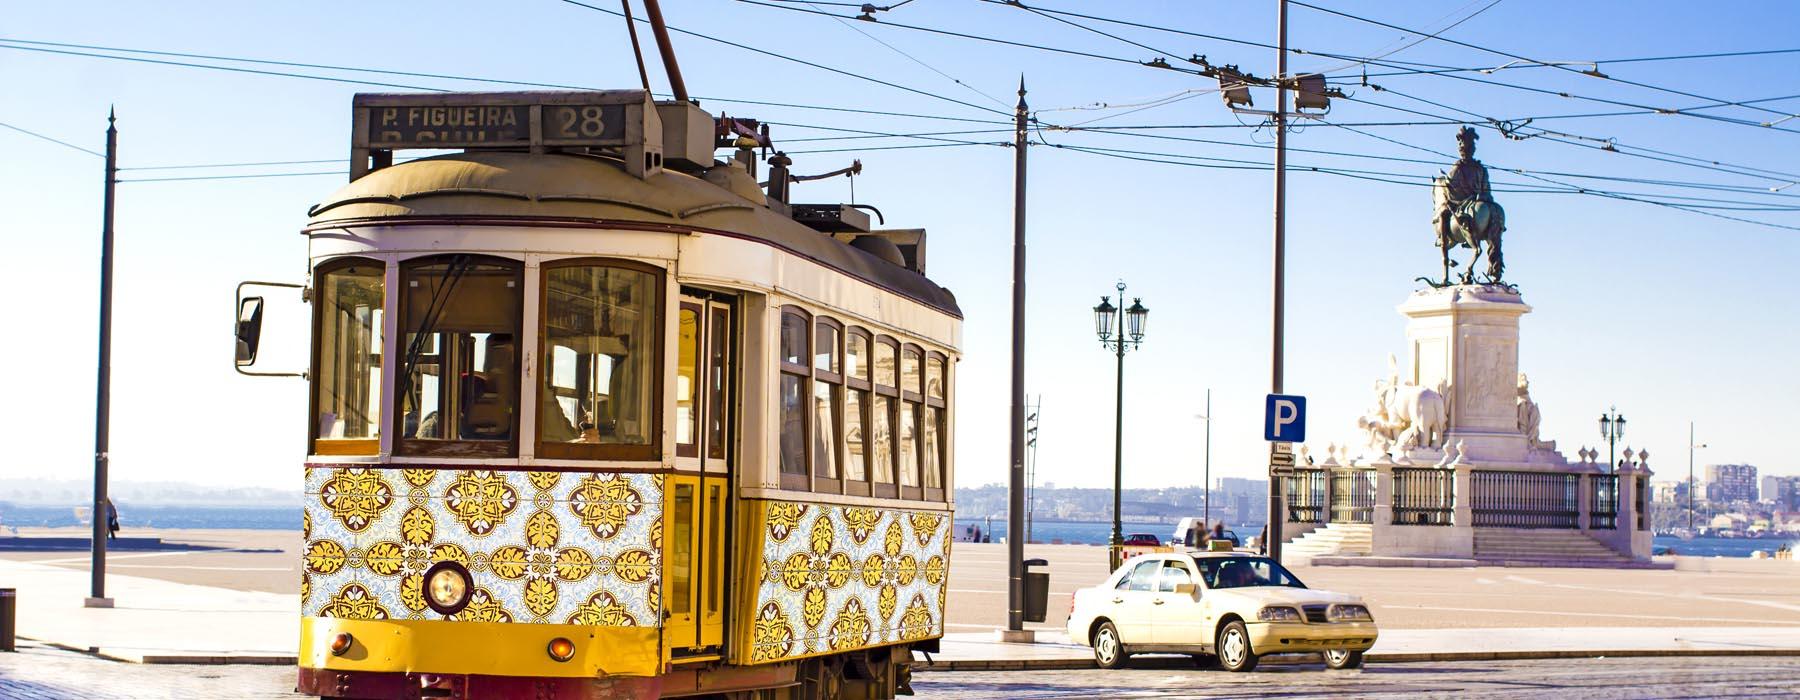 Visita Lisboa en tranvía